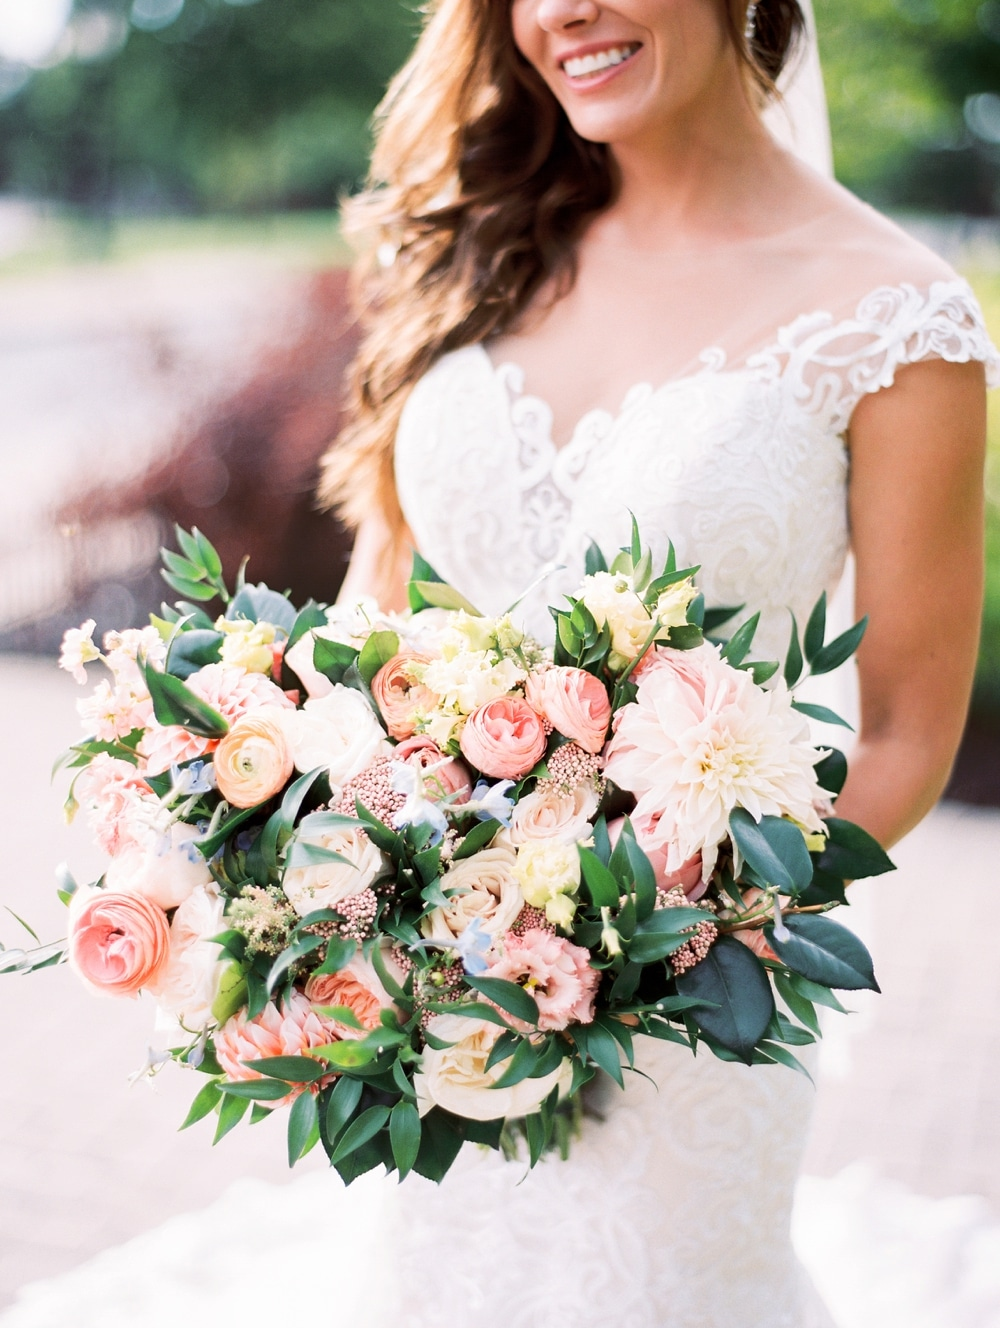 kristin-la-voie-photography-henry-ford-museum-detroit-wedding-photographer-151